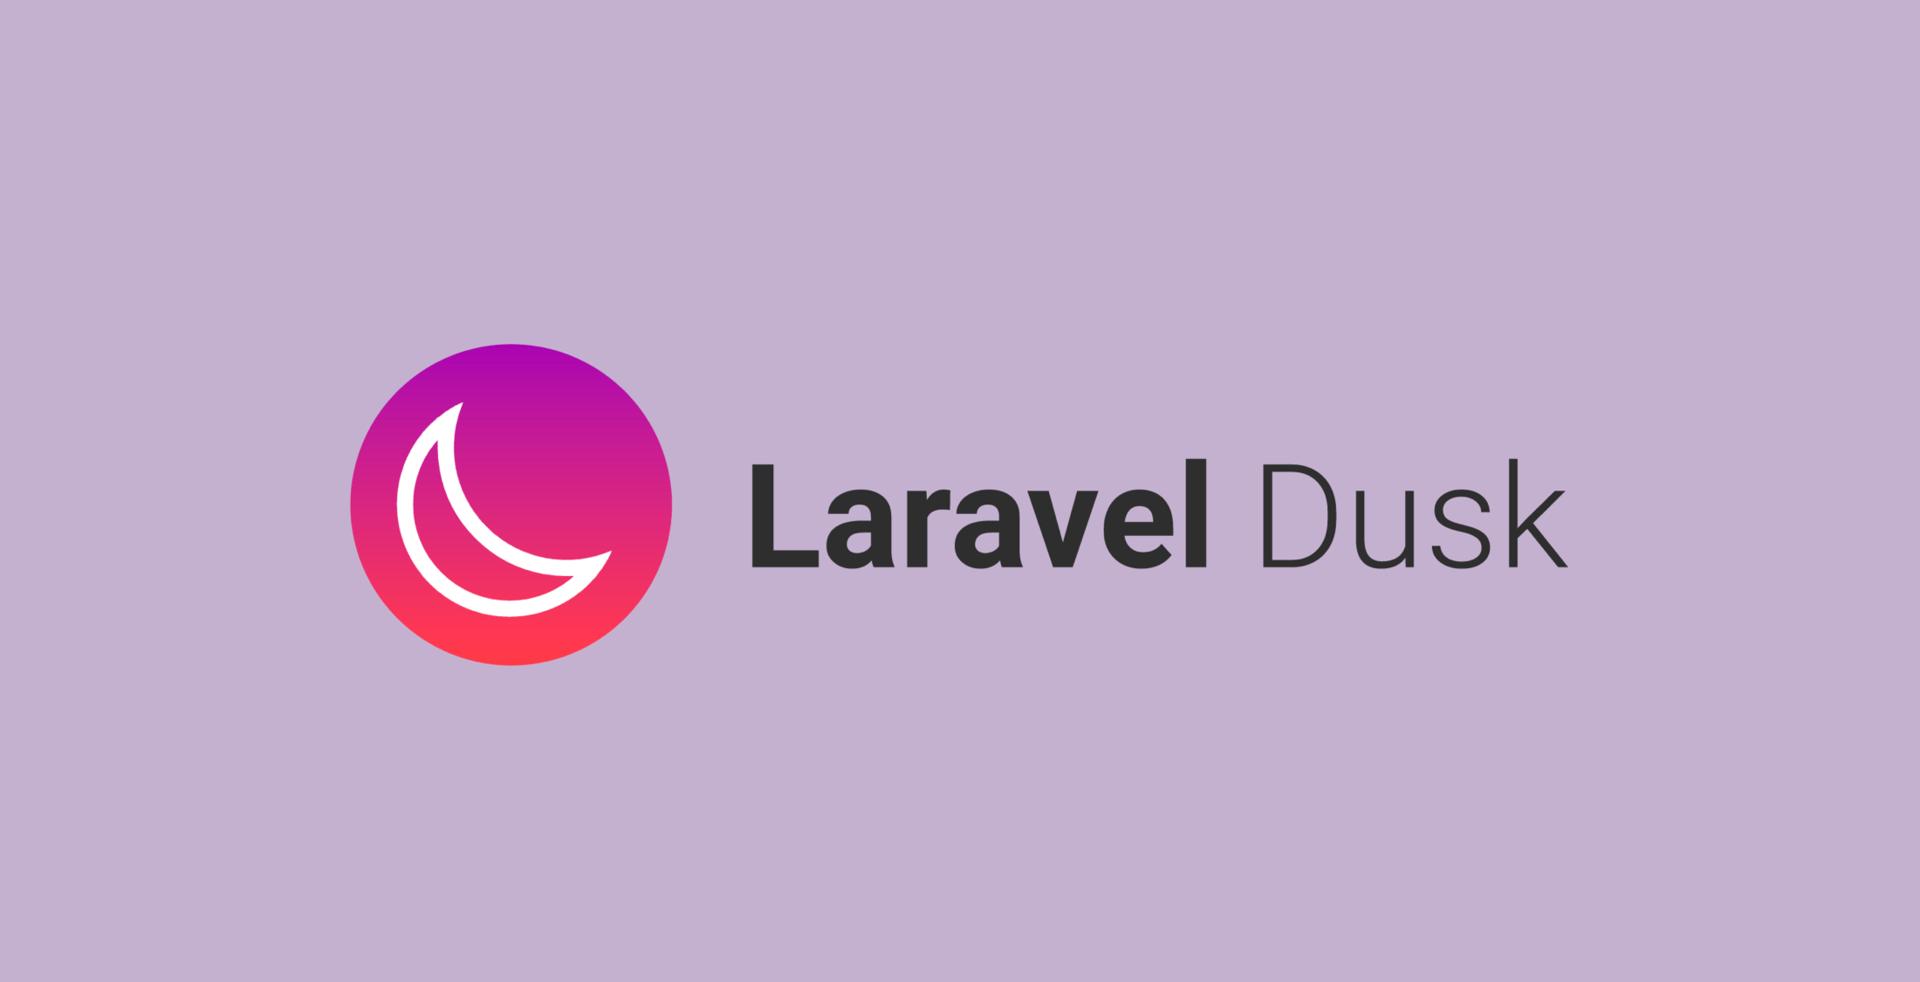 Laravel Dusk